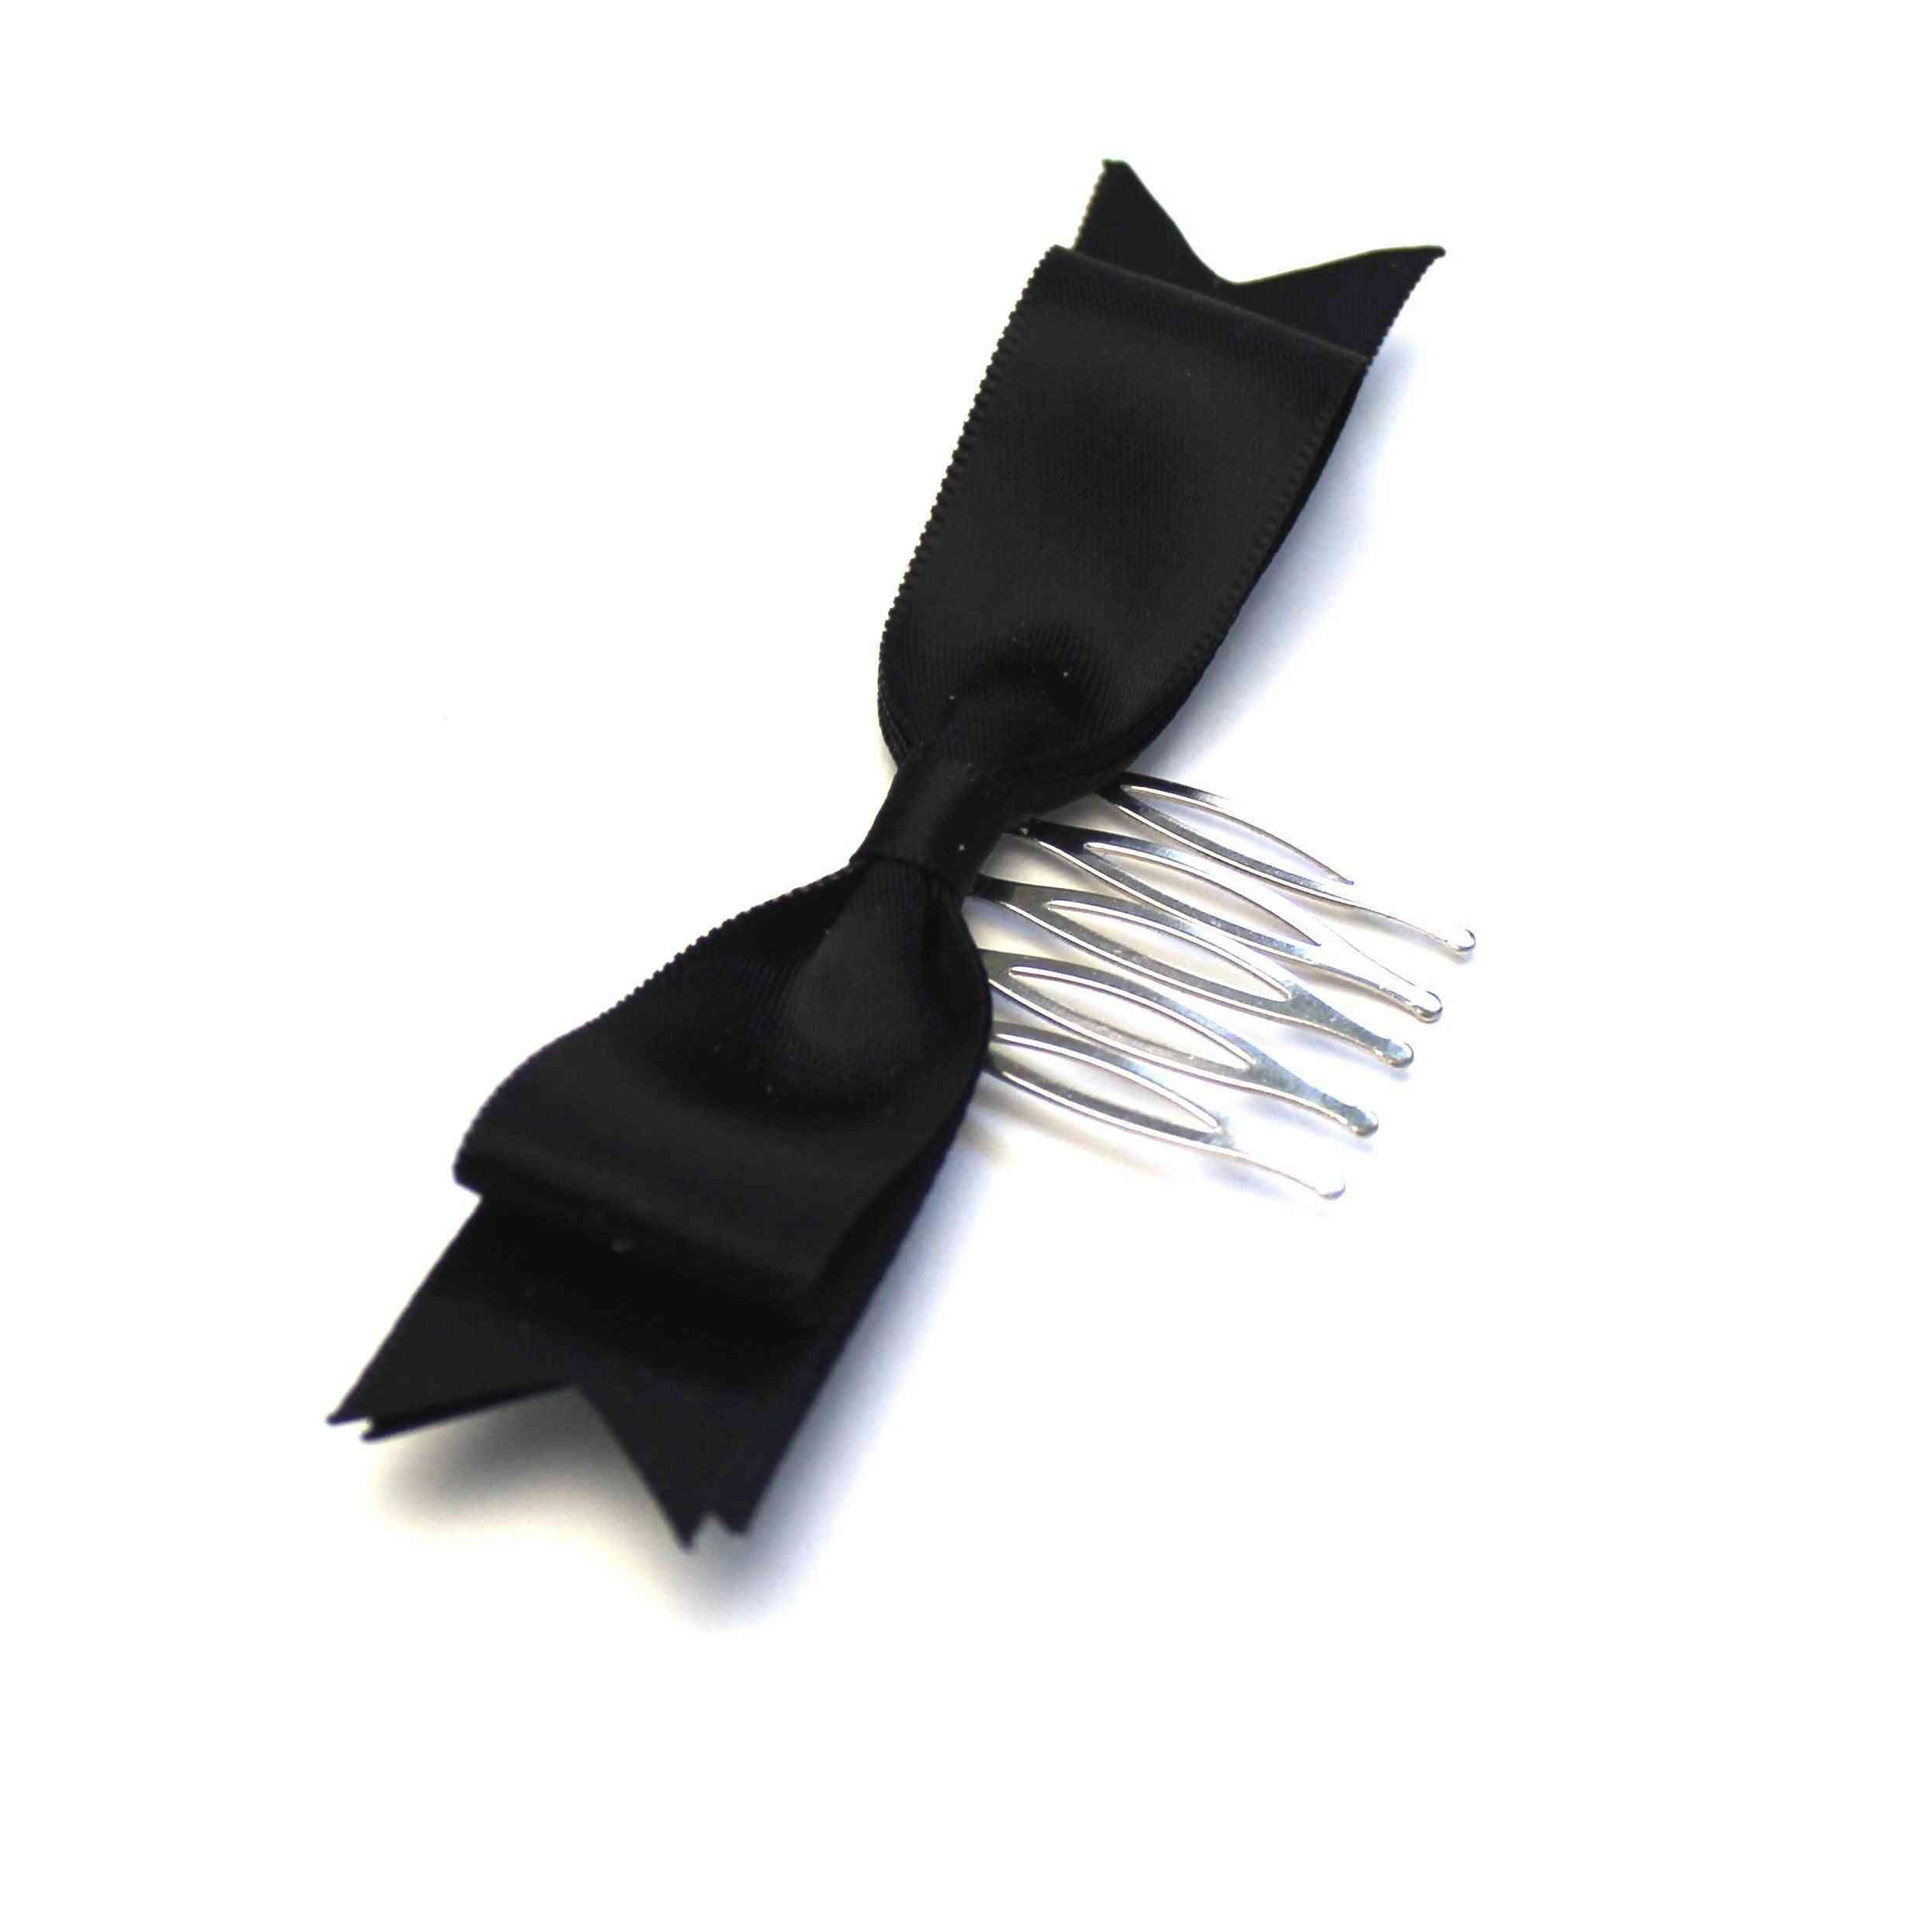 Enchantress Hairtye Bow Comb